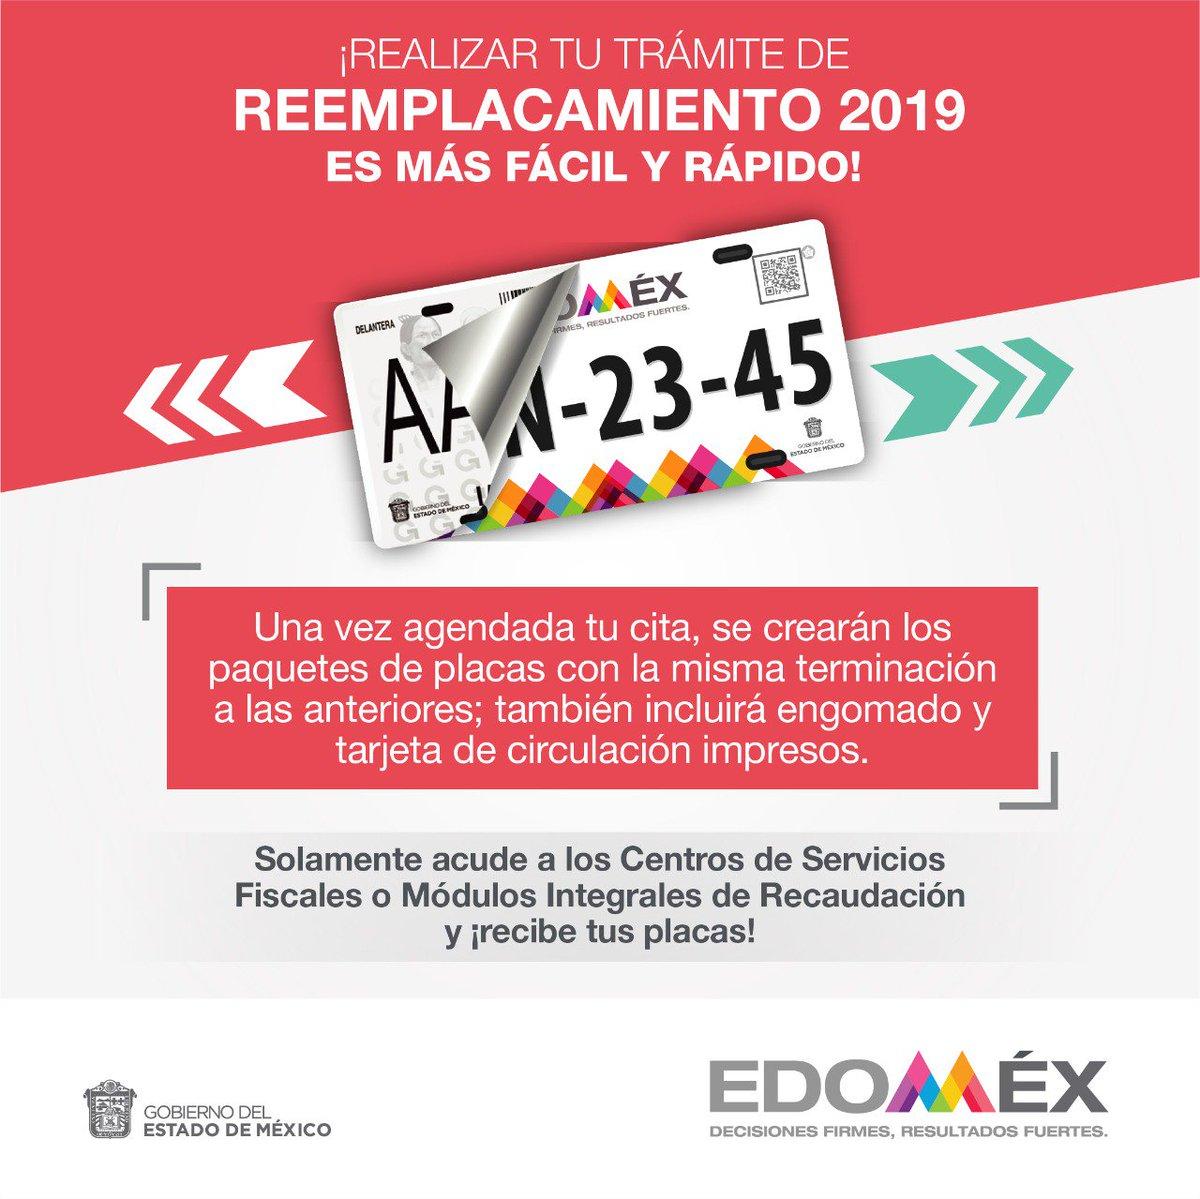 Reemplacamientoedoméx2019 Hashtag On Twitter